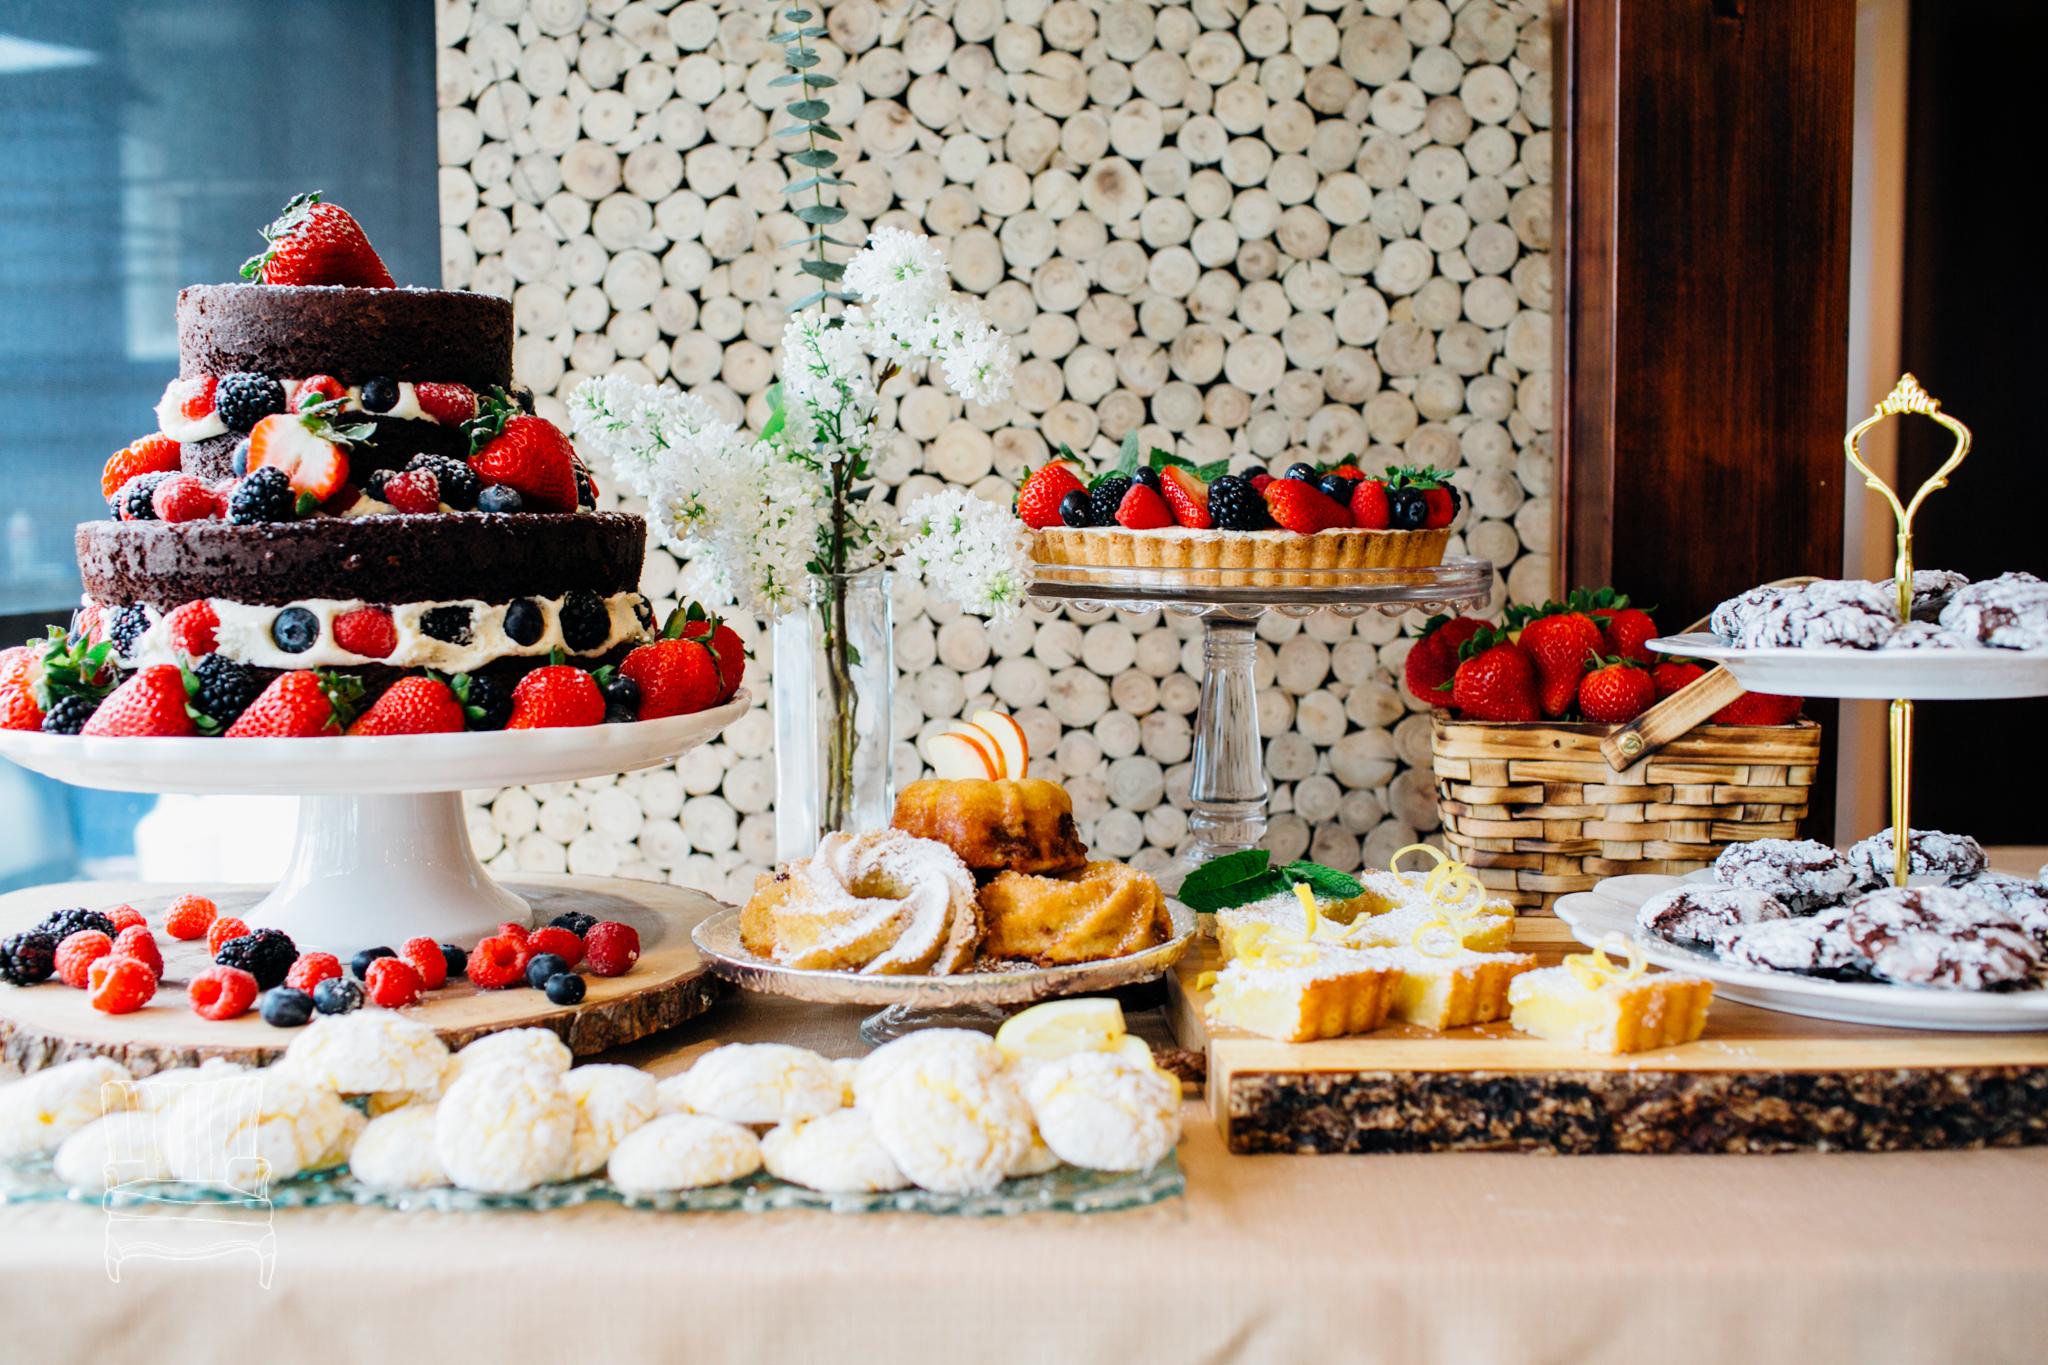 bellingham-food-dessert-marketing-photographer-photo -3.jpg